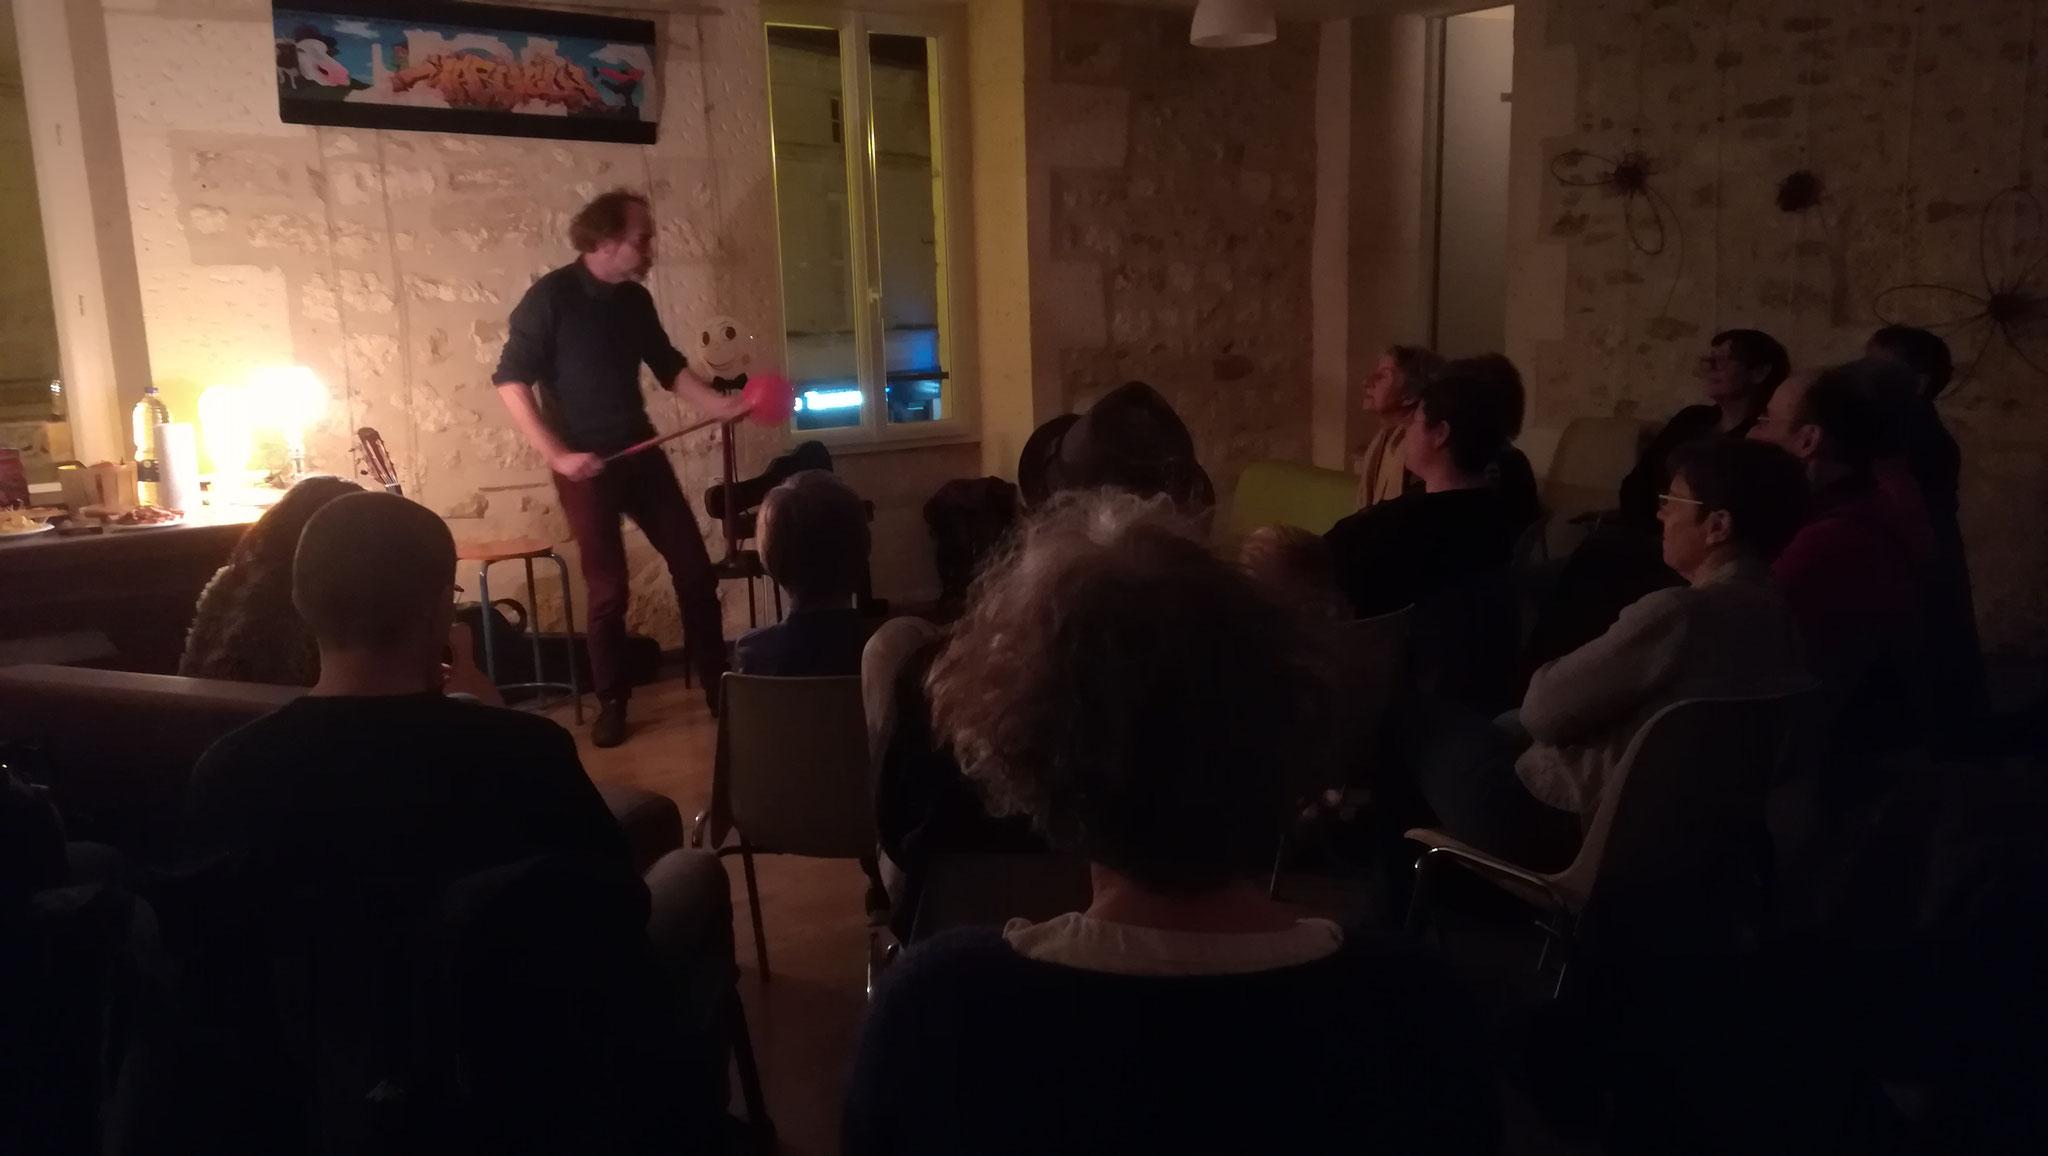 Veillée Littéraire avec David Sire à Mareuil